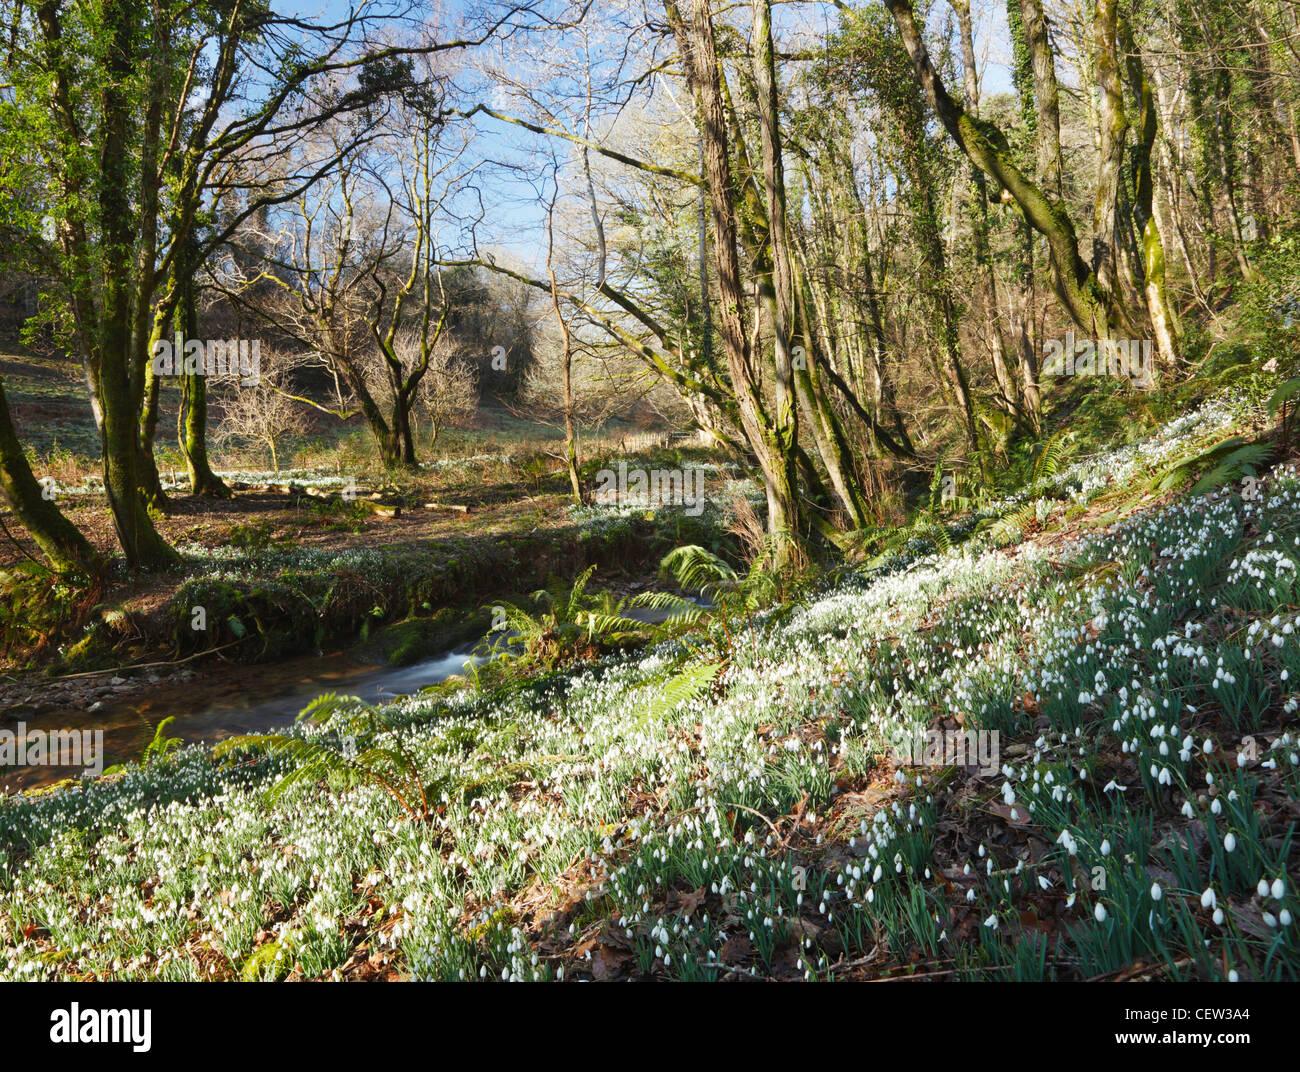 North Hawkwell Wood AKA Snowdrop Valley. Exmoor National Park. Somerset. England. UK. - Stock Image